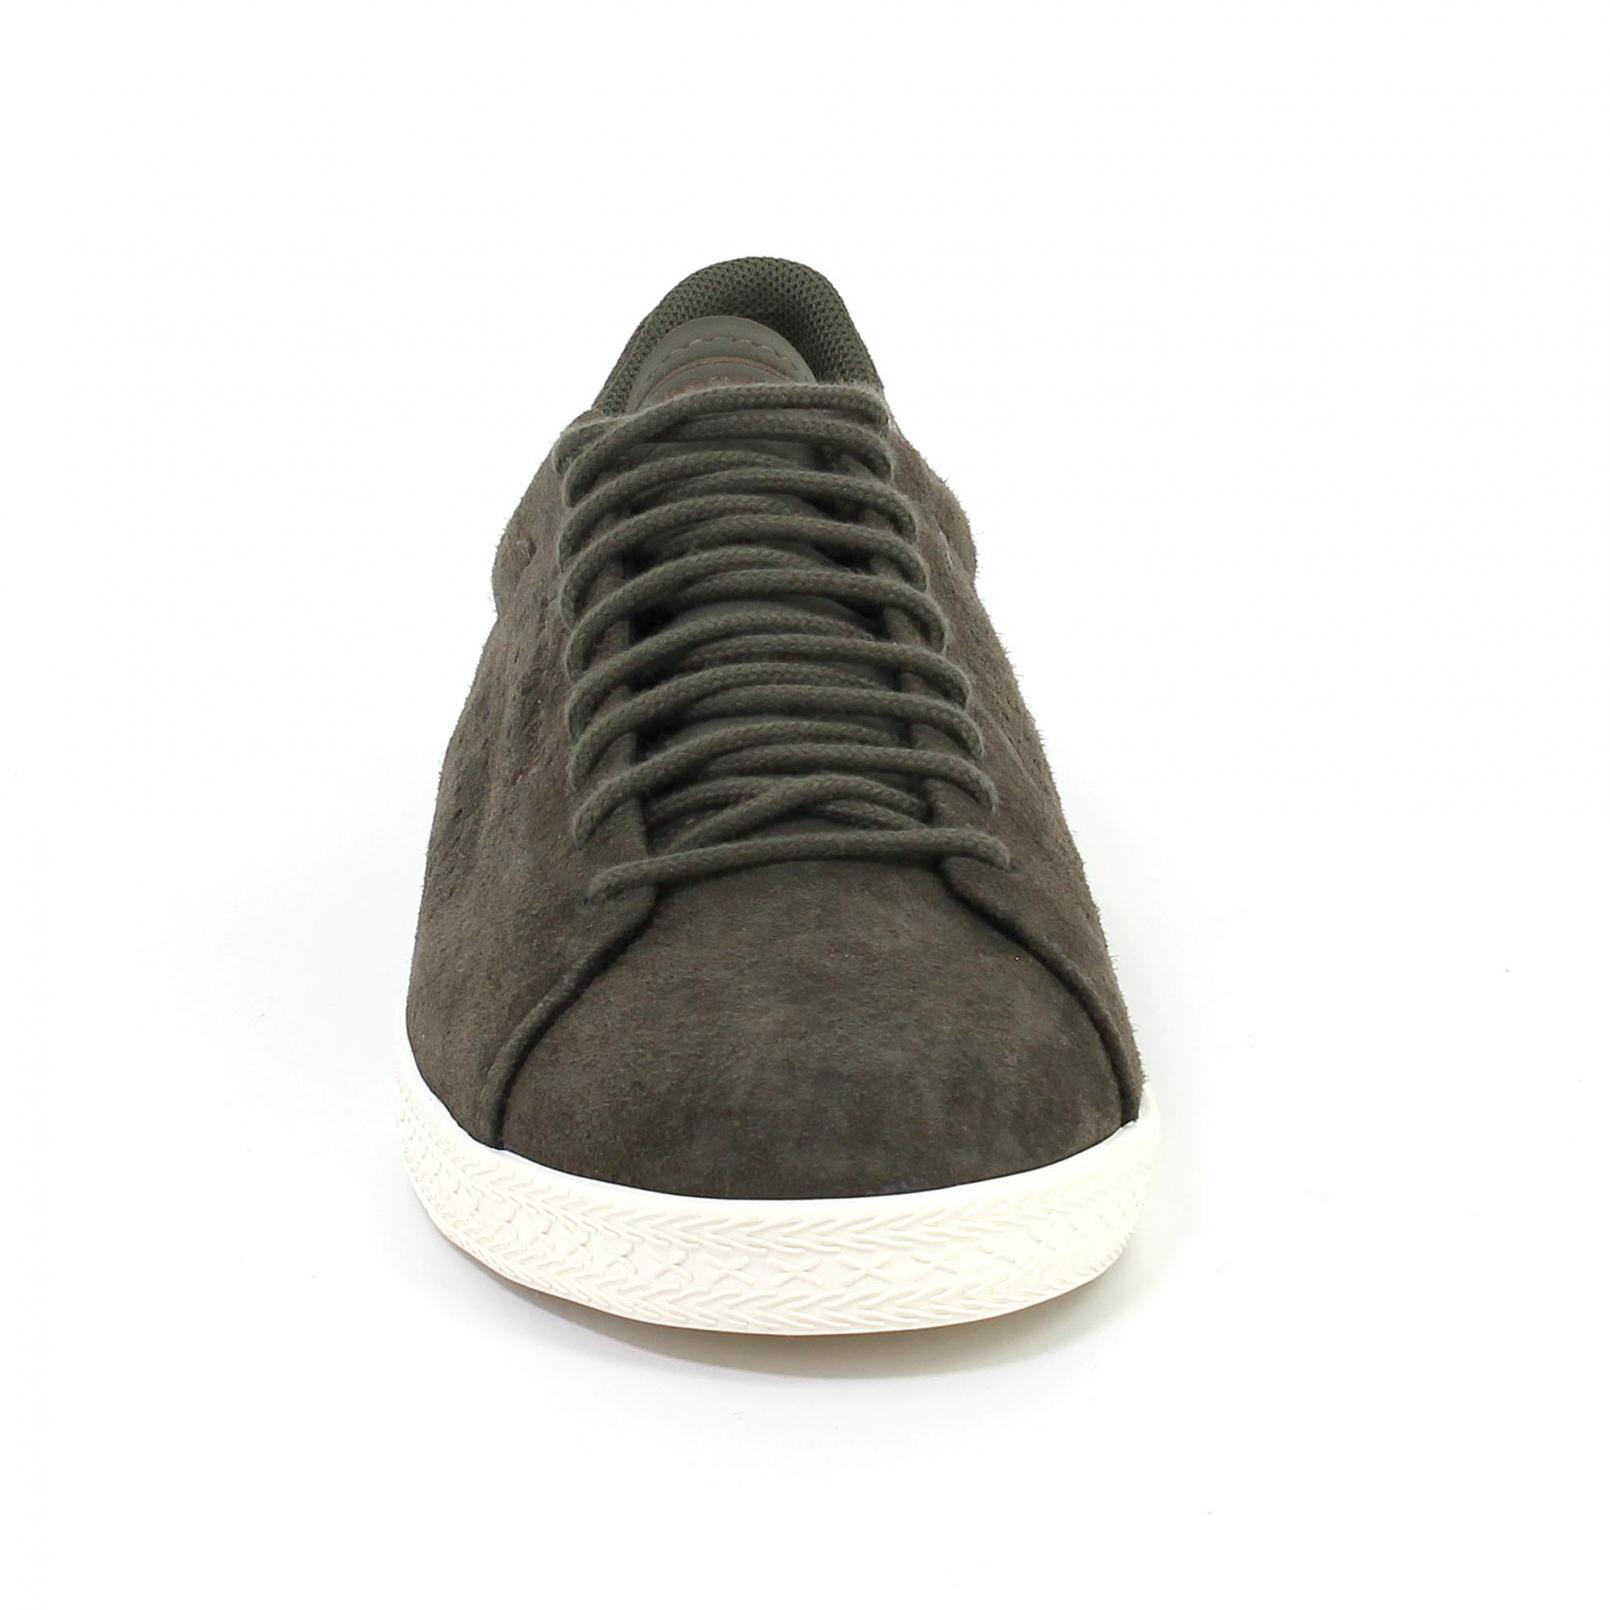 Shoes – Le Coq Sportif Charline Nubuck Green